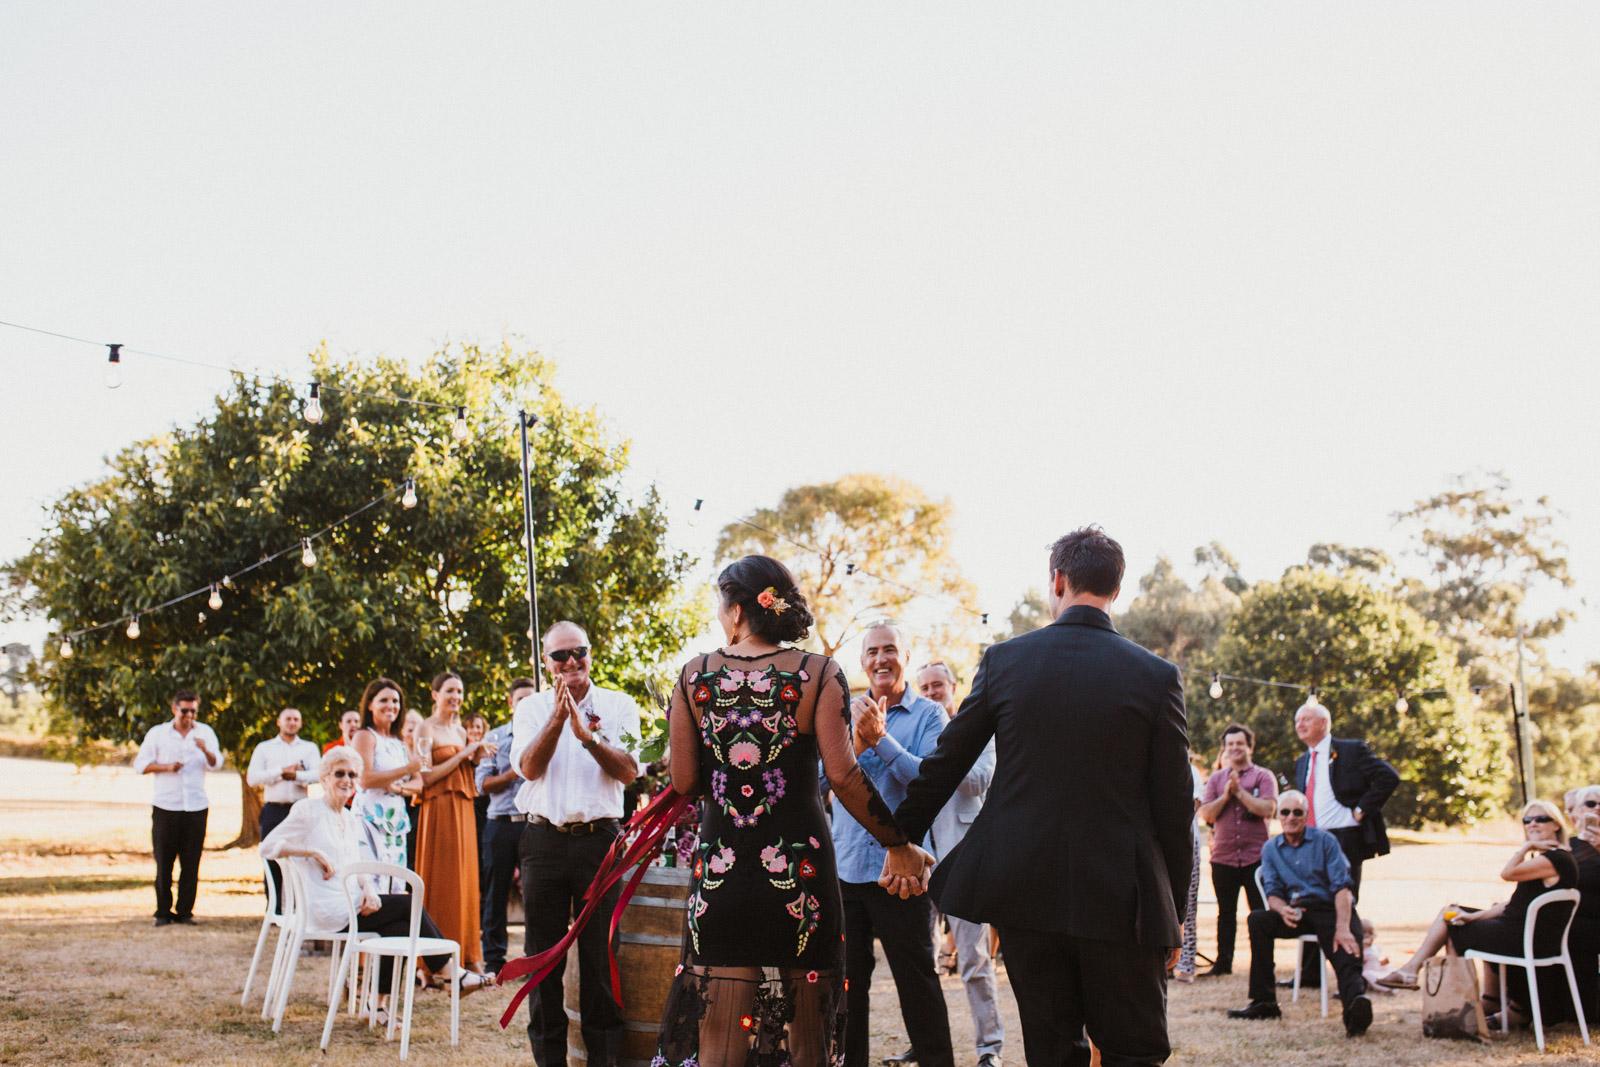 ZD-Melbourne Wedding Photographer-Dean Raphael-106.jpg